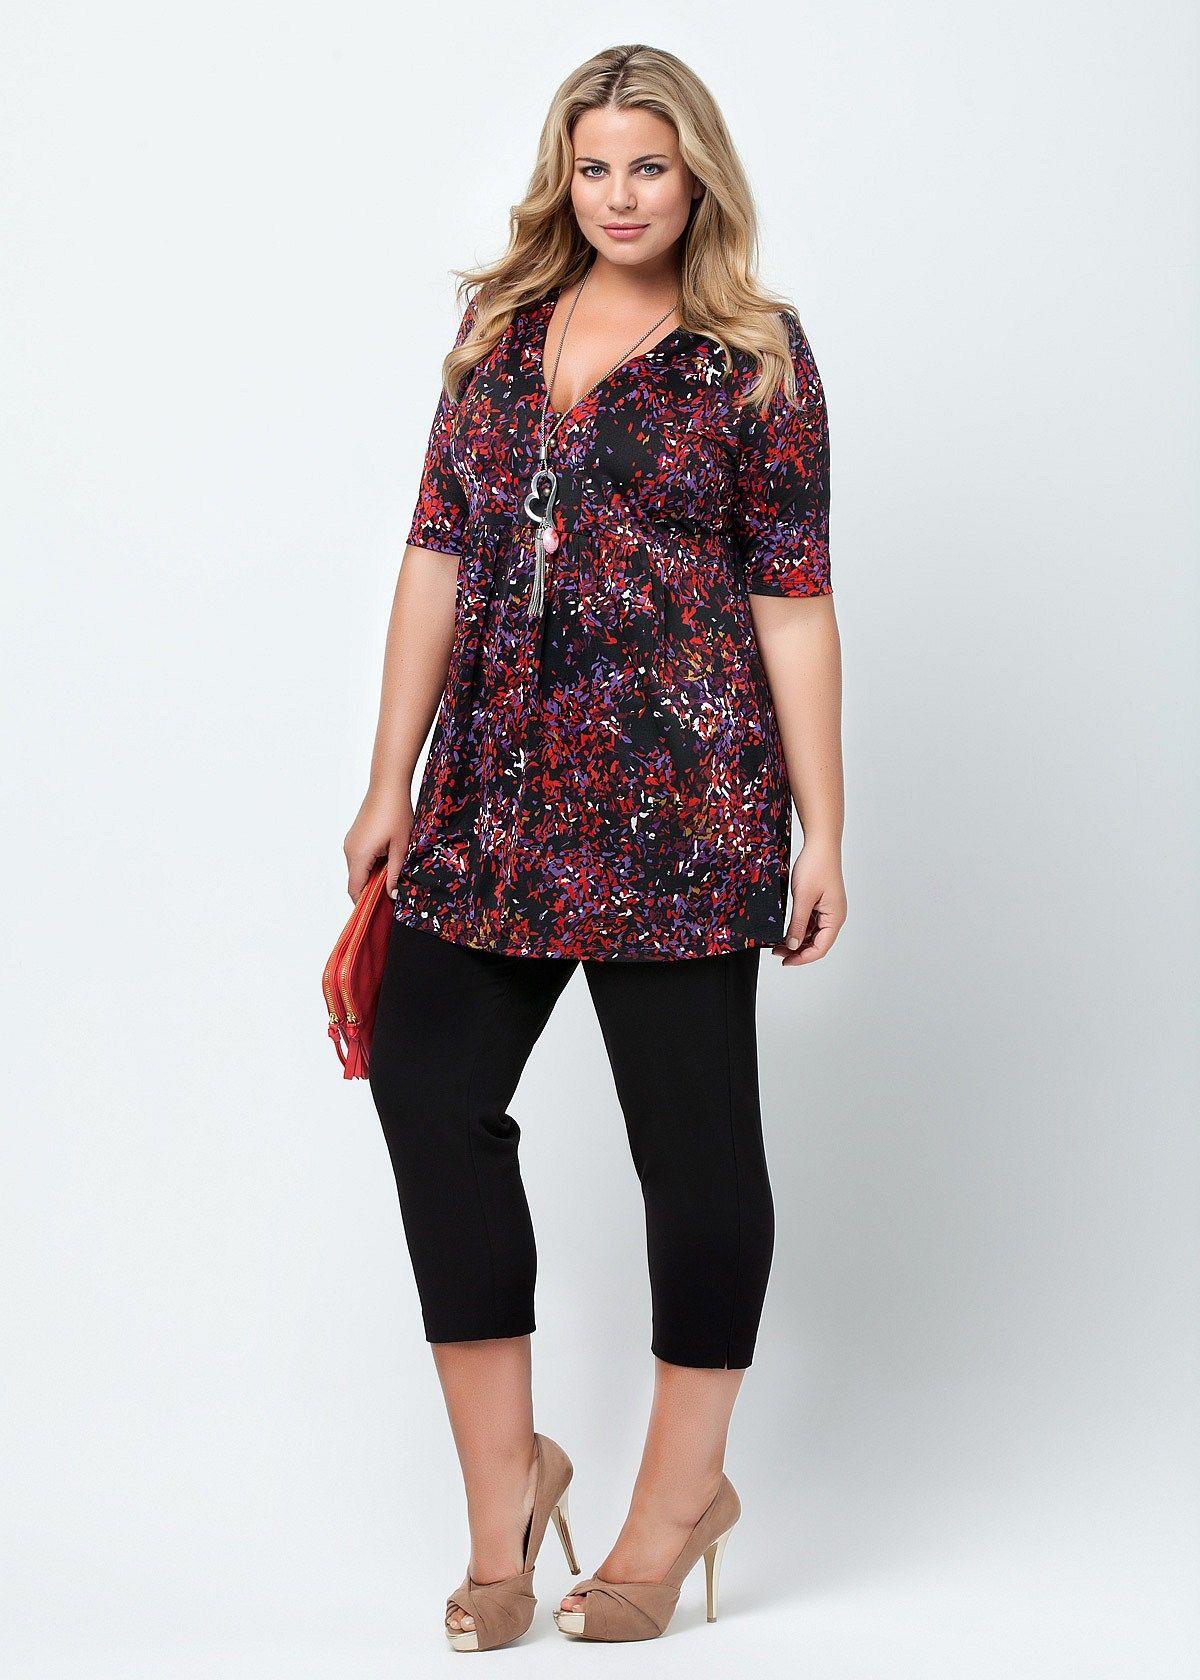 Cheap fashionable plus size clothing 1